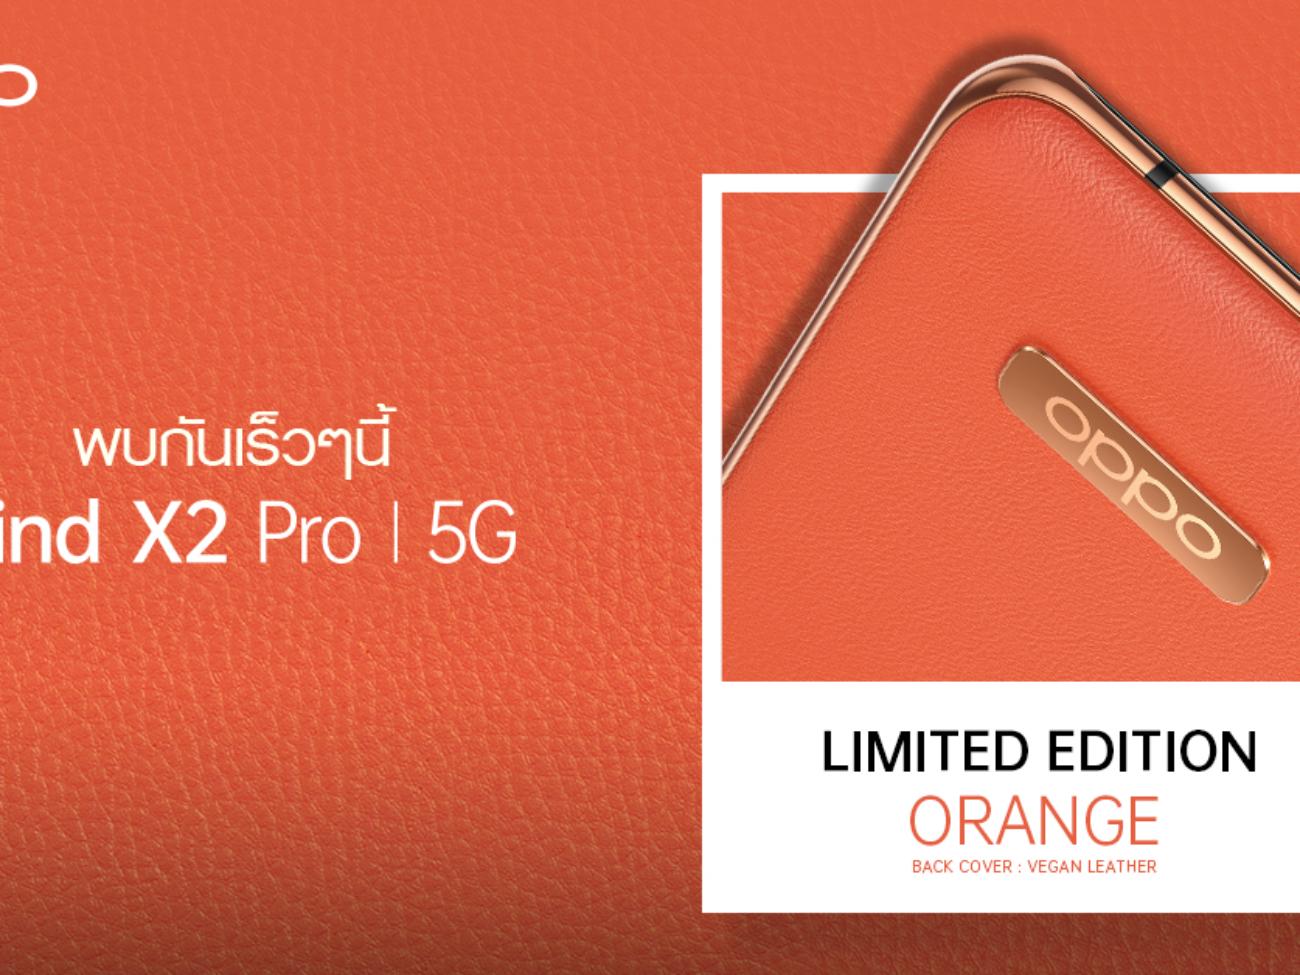 OPPO-Find-X2-Pro-5G-Orange-Cover